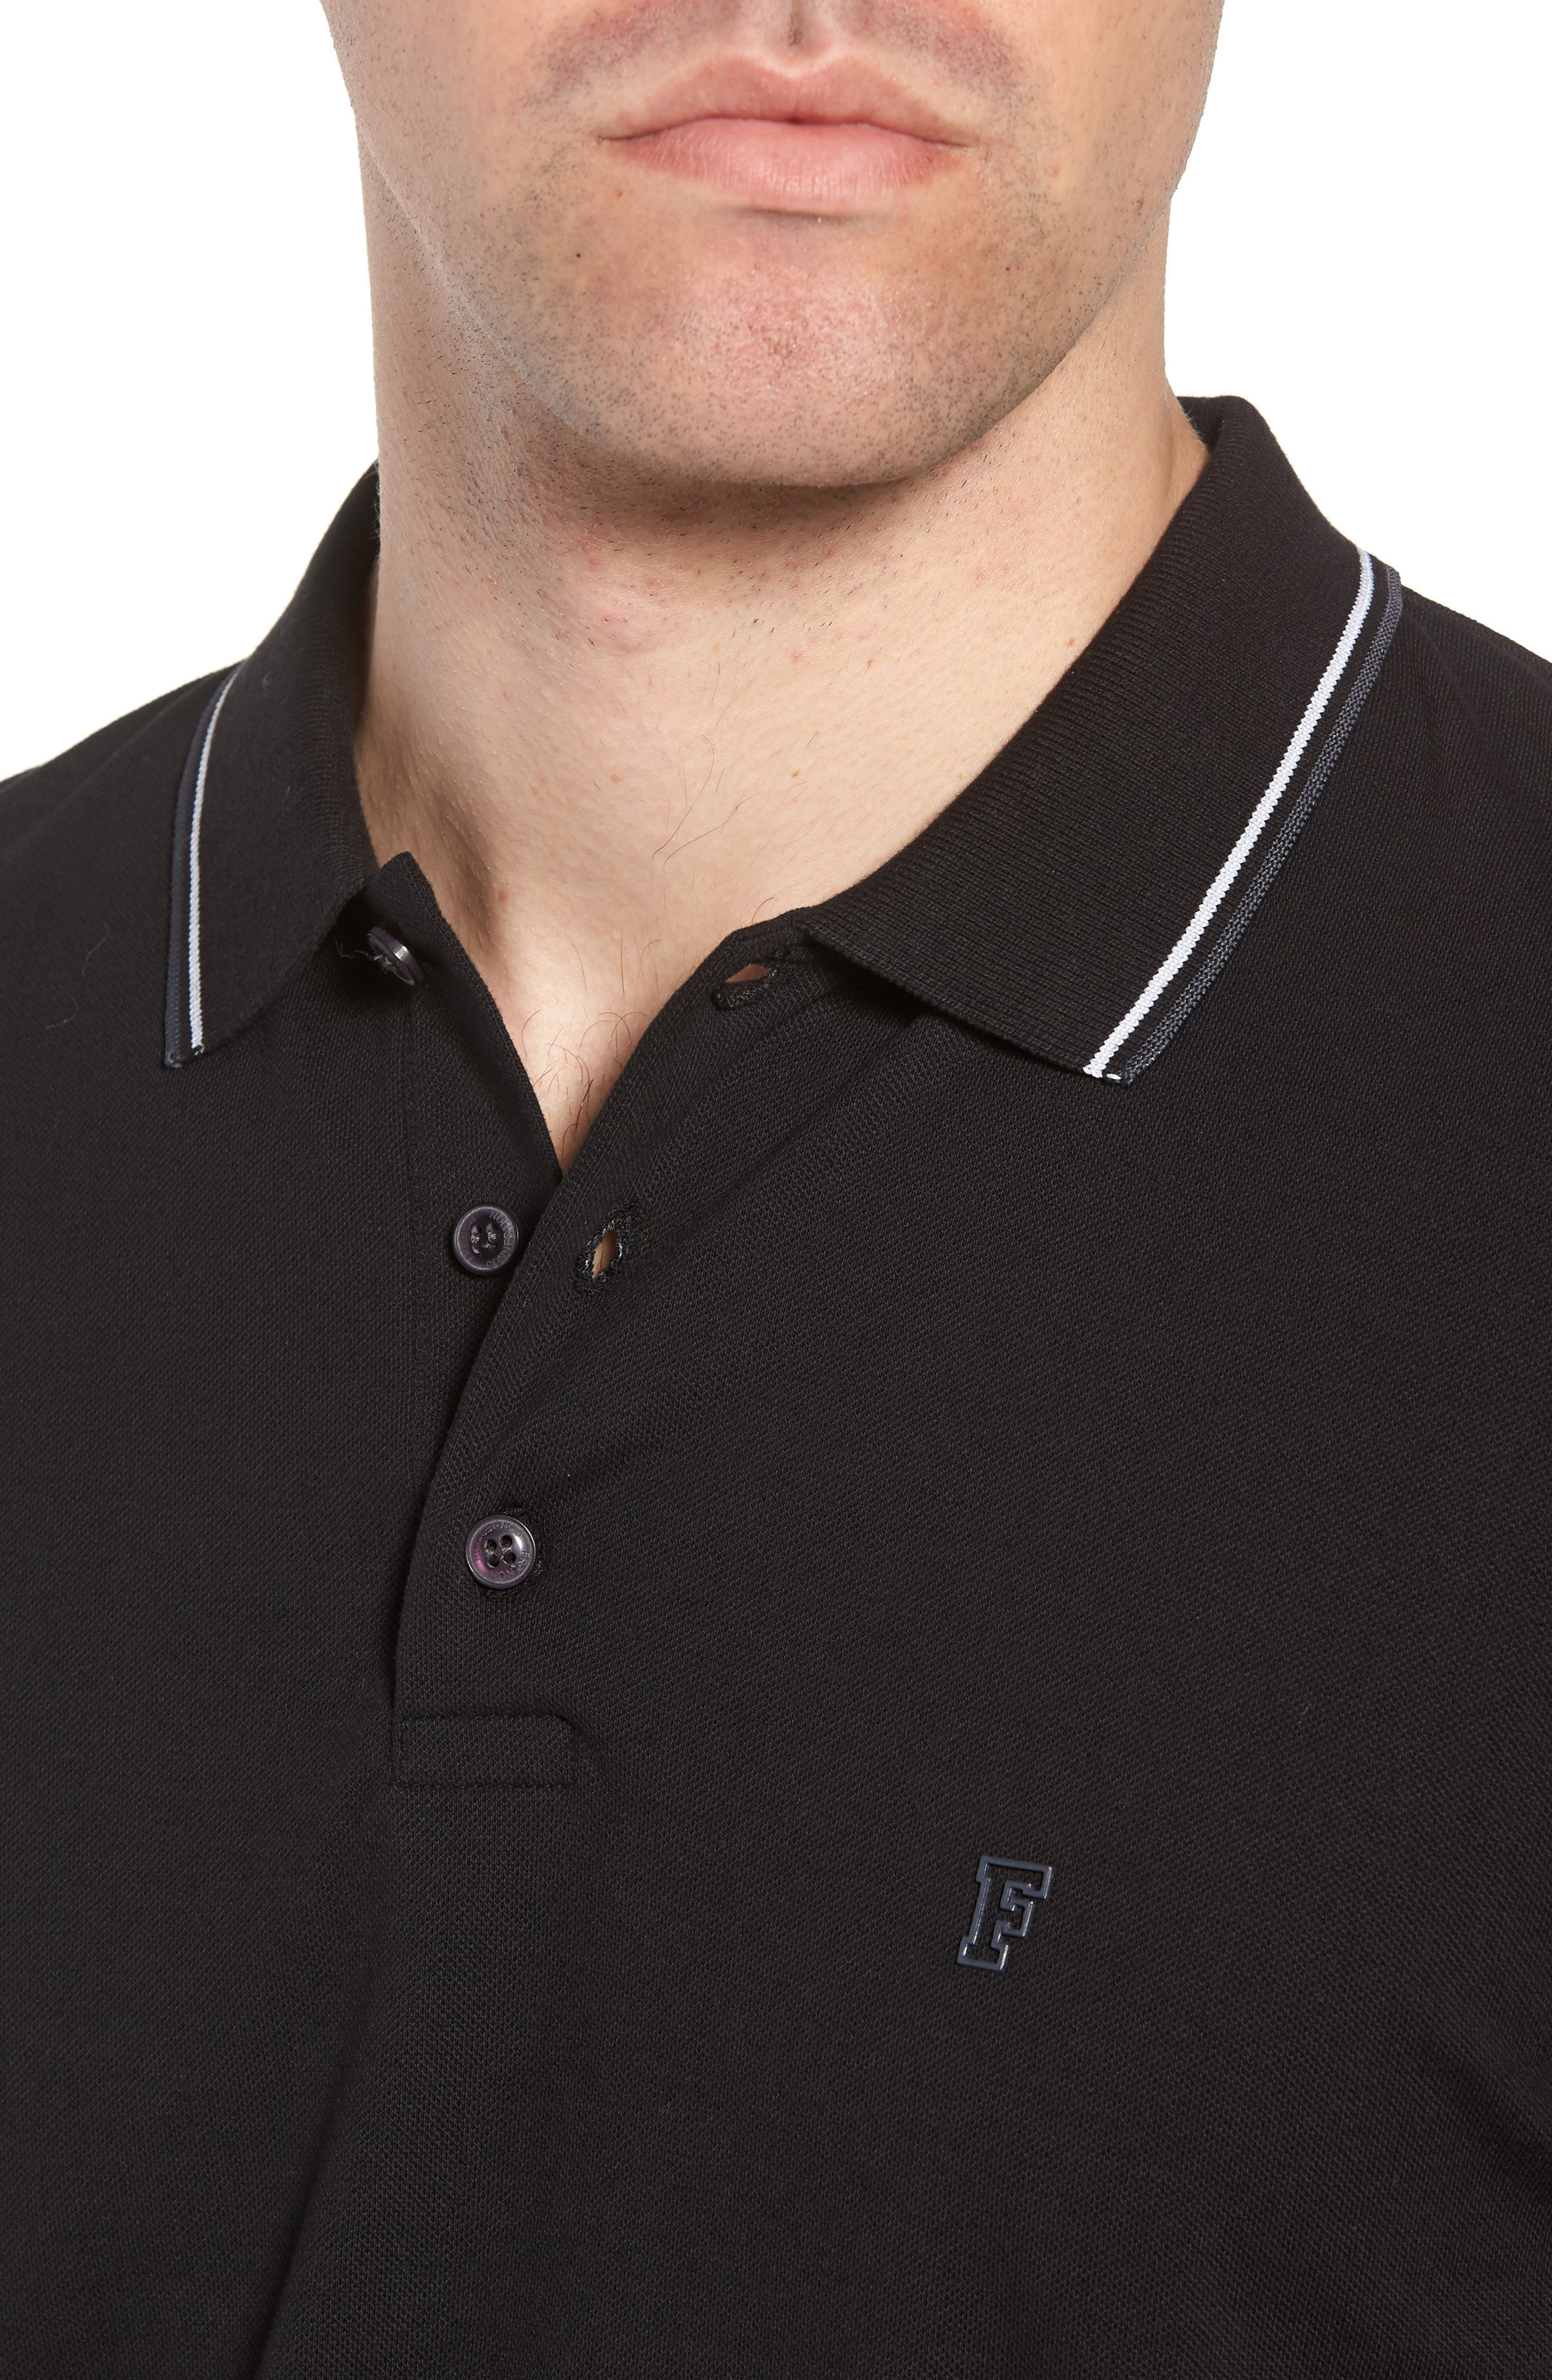 Cotton Polo Shirt,                             Alternate thumbnail 4, color,                             BLACK